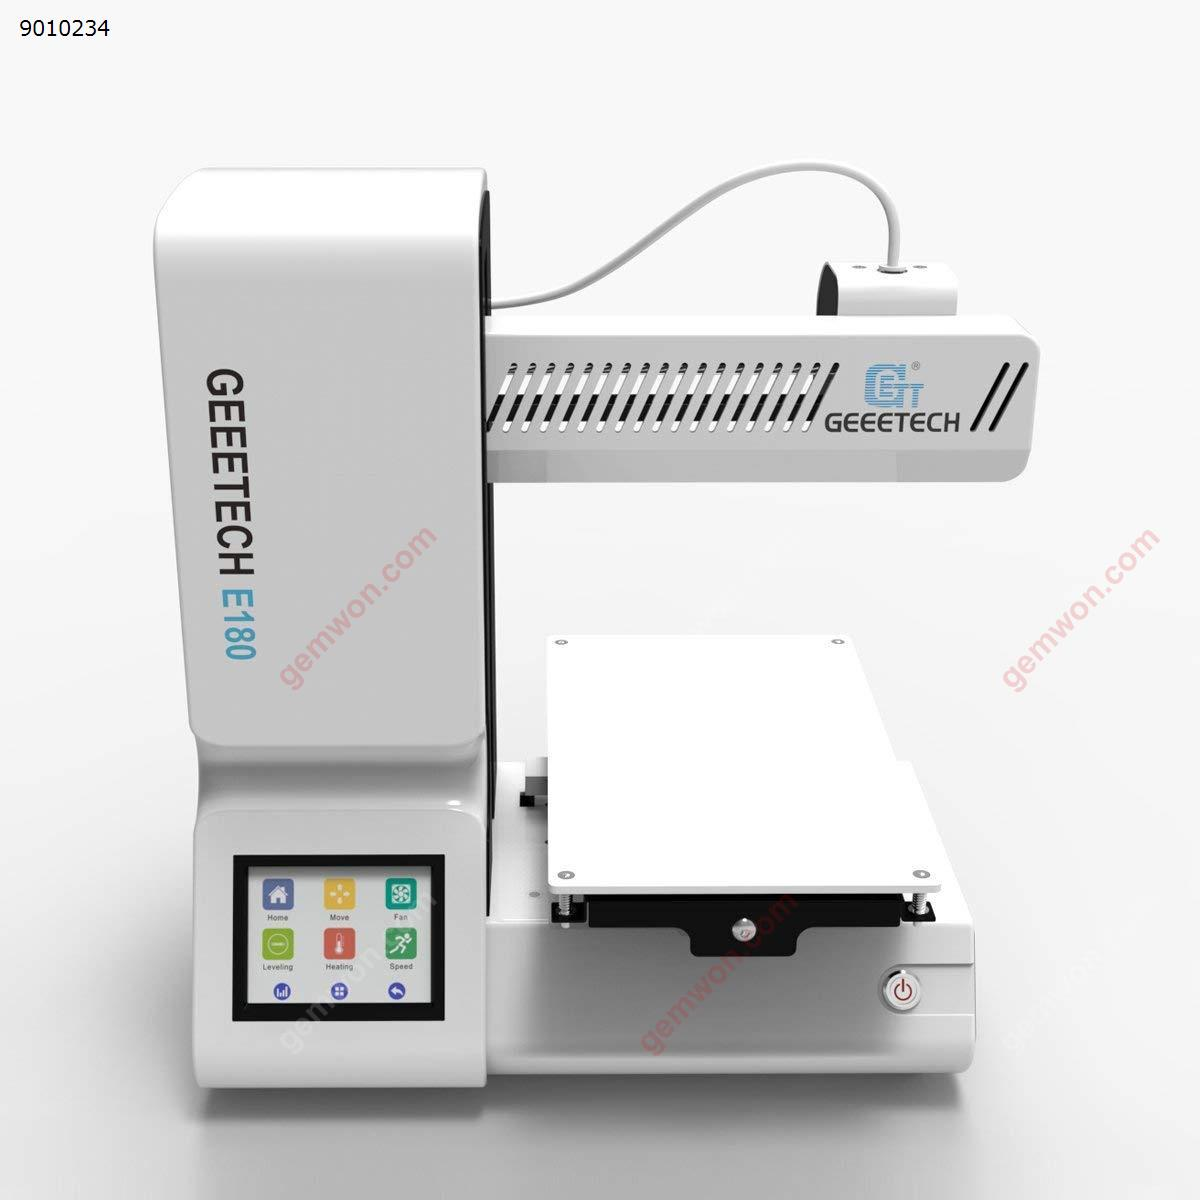 Geeetech 3D printer E180 desktop full color touch screen 3D printer E180